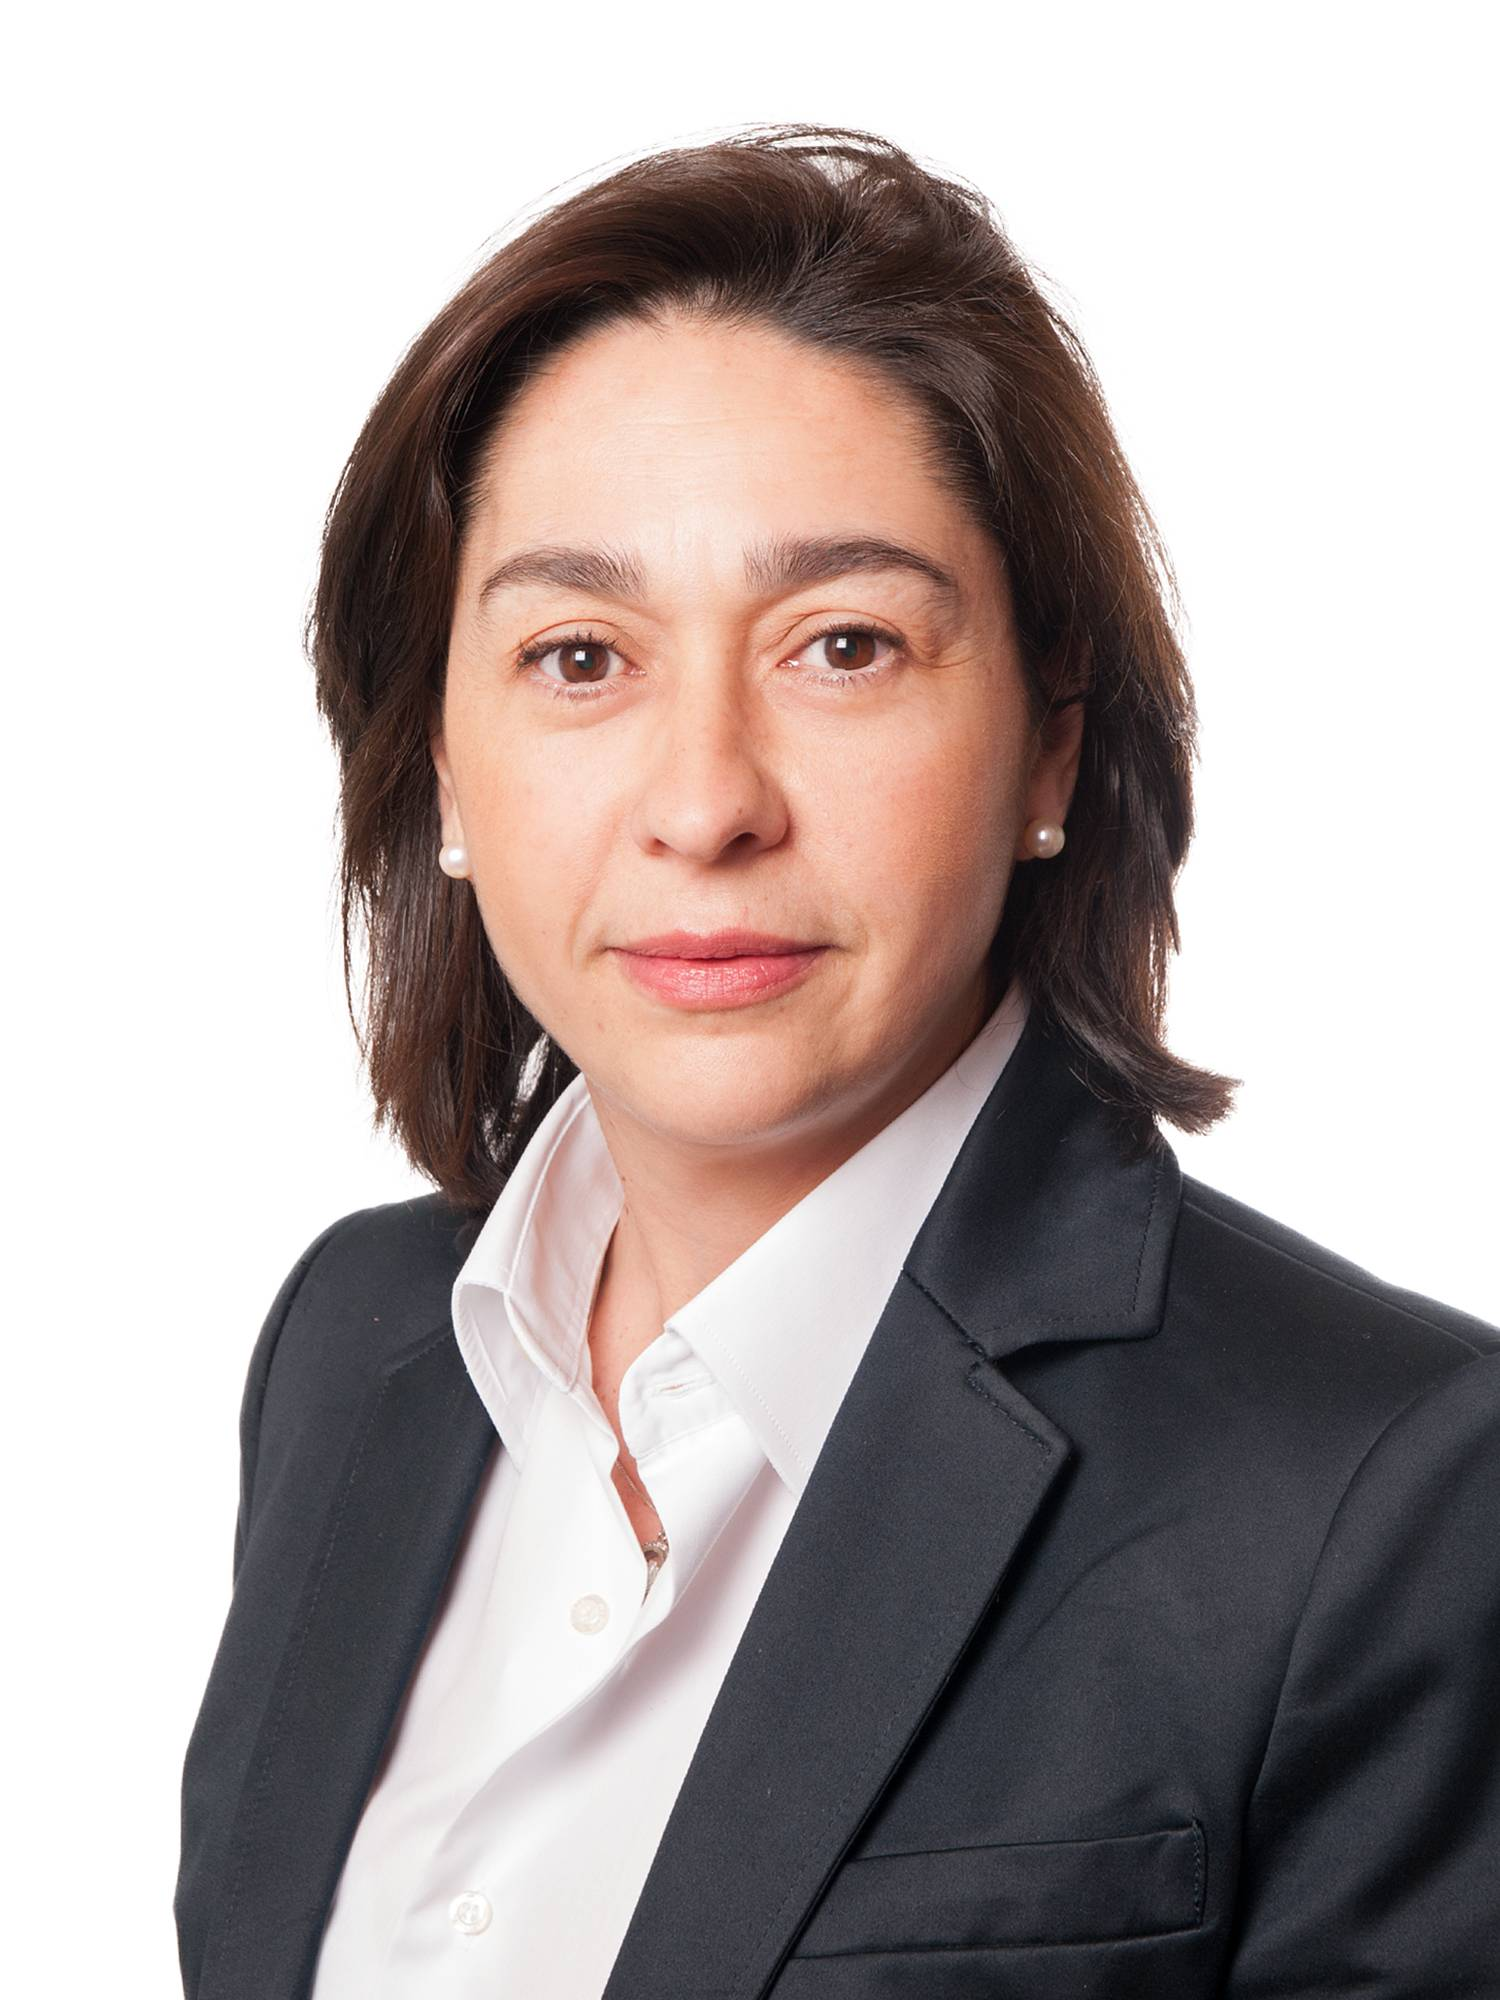 Alicia Cantalapiedra Recio